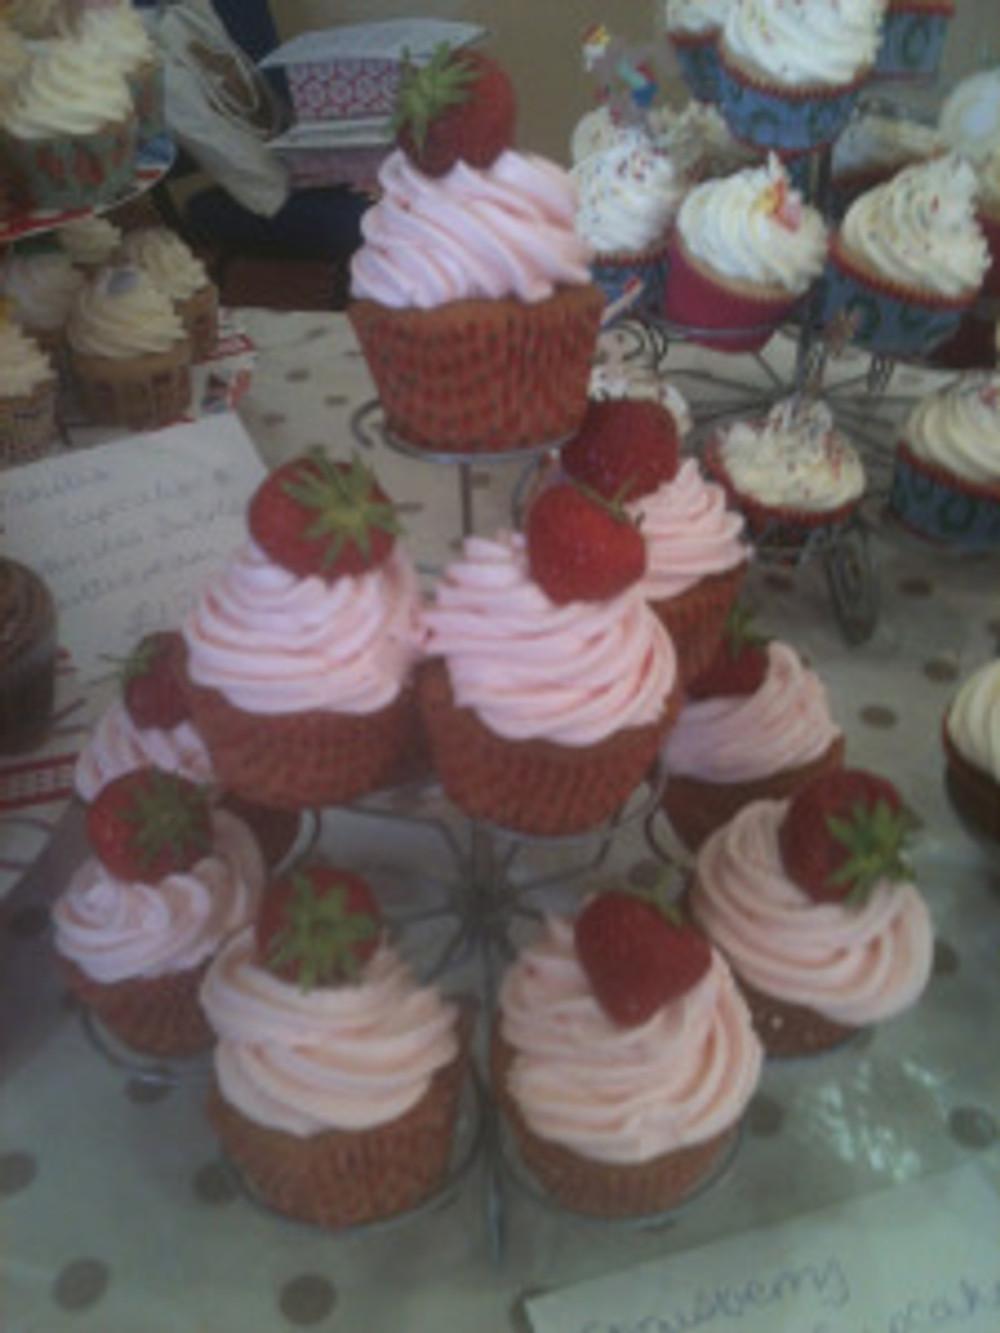 The Primrose Bakery's Strawberry Cupcakes